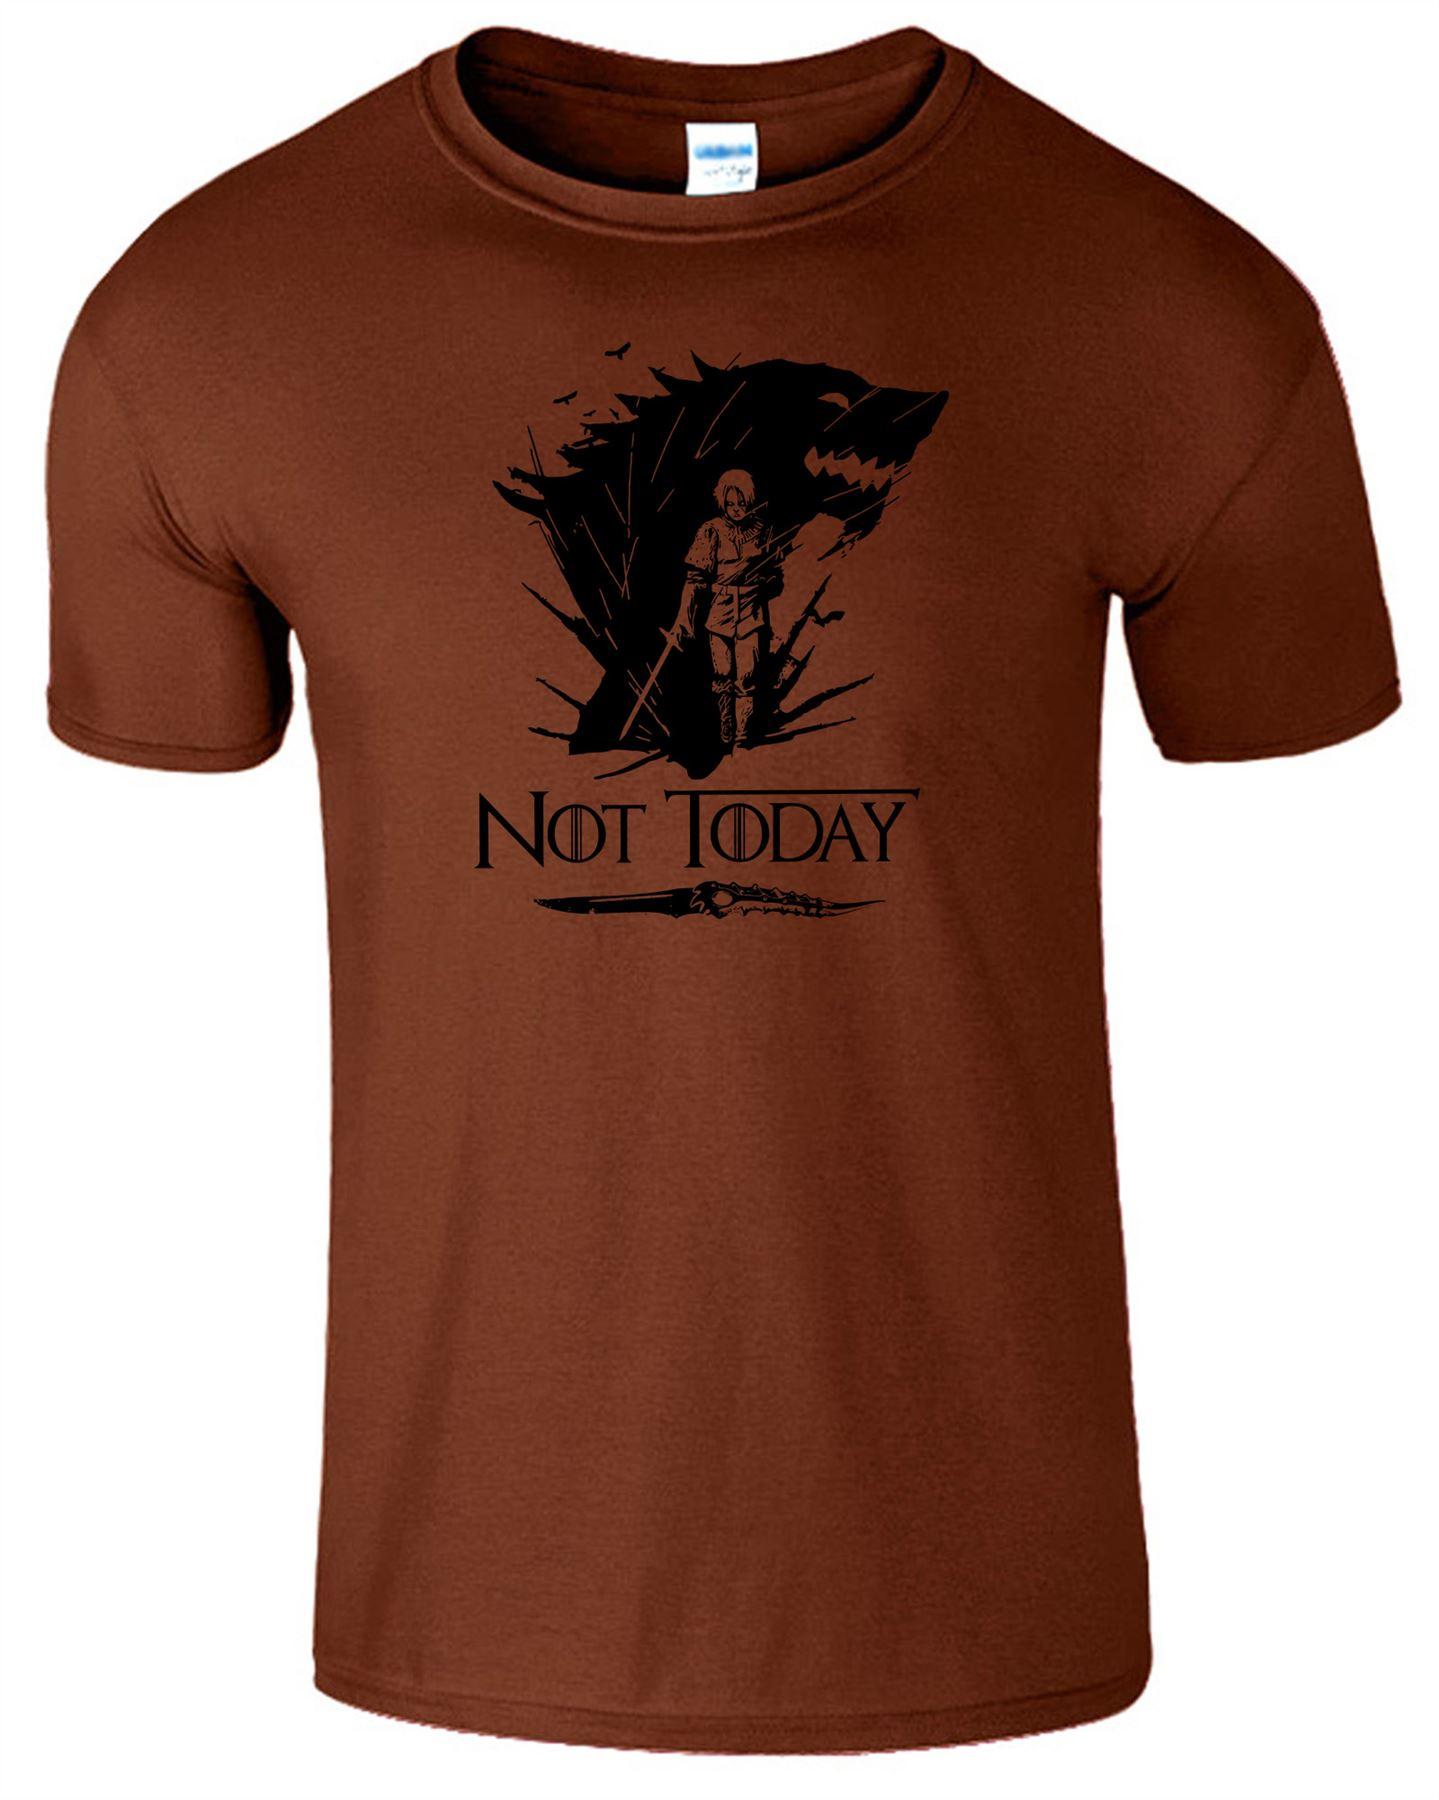 Arya-Stark-Not-Today-T-Shirt-Mens-Game-Season-Womens-Shirt-Adults-Unisex-Fit Indexbild 7